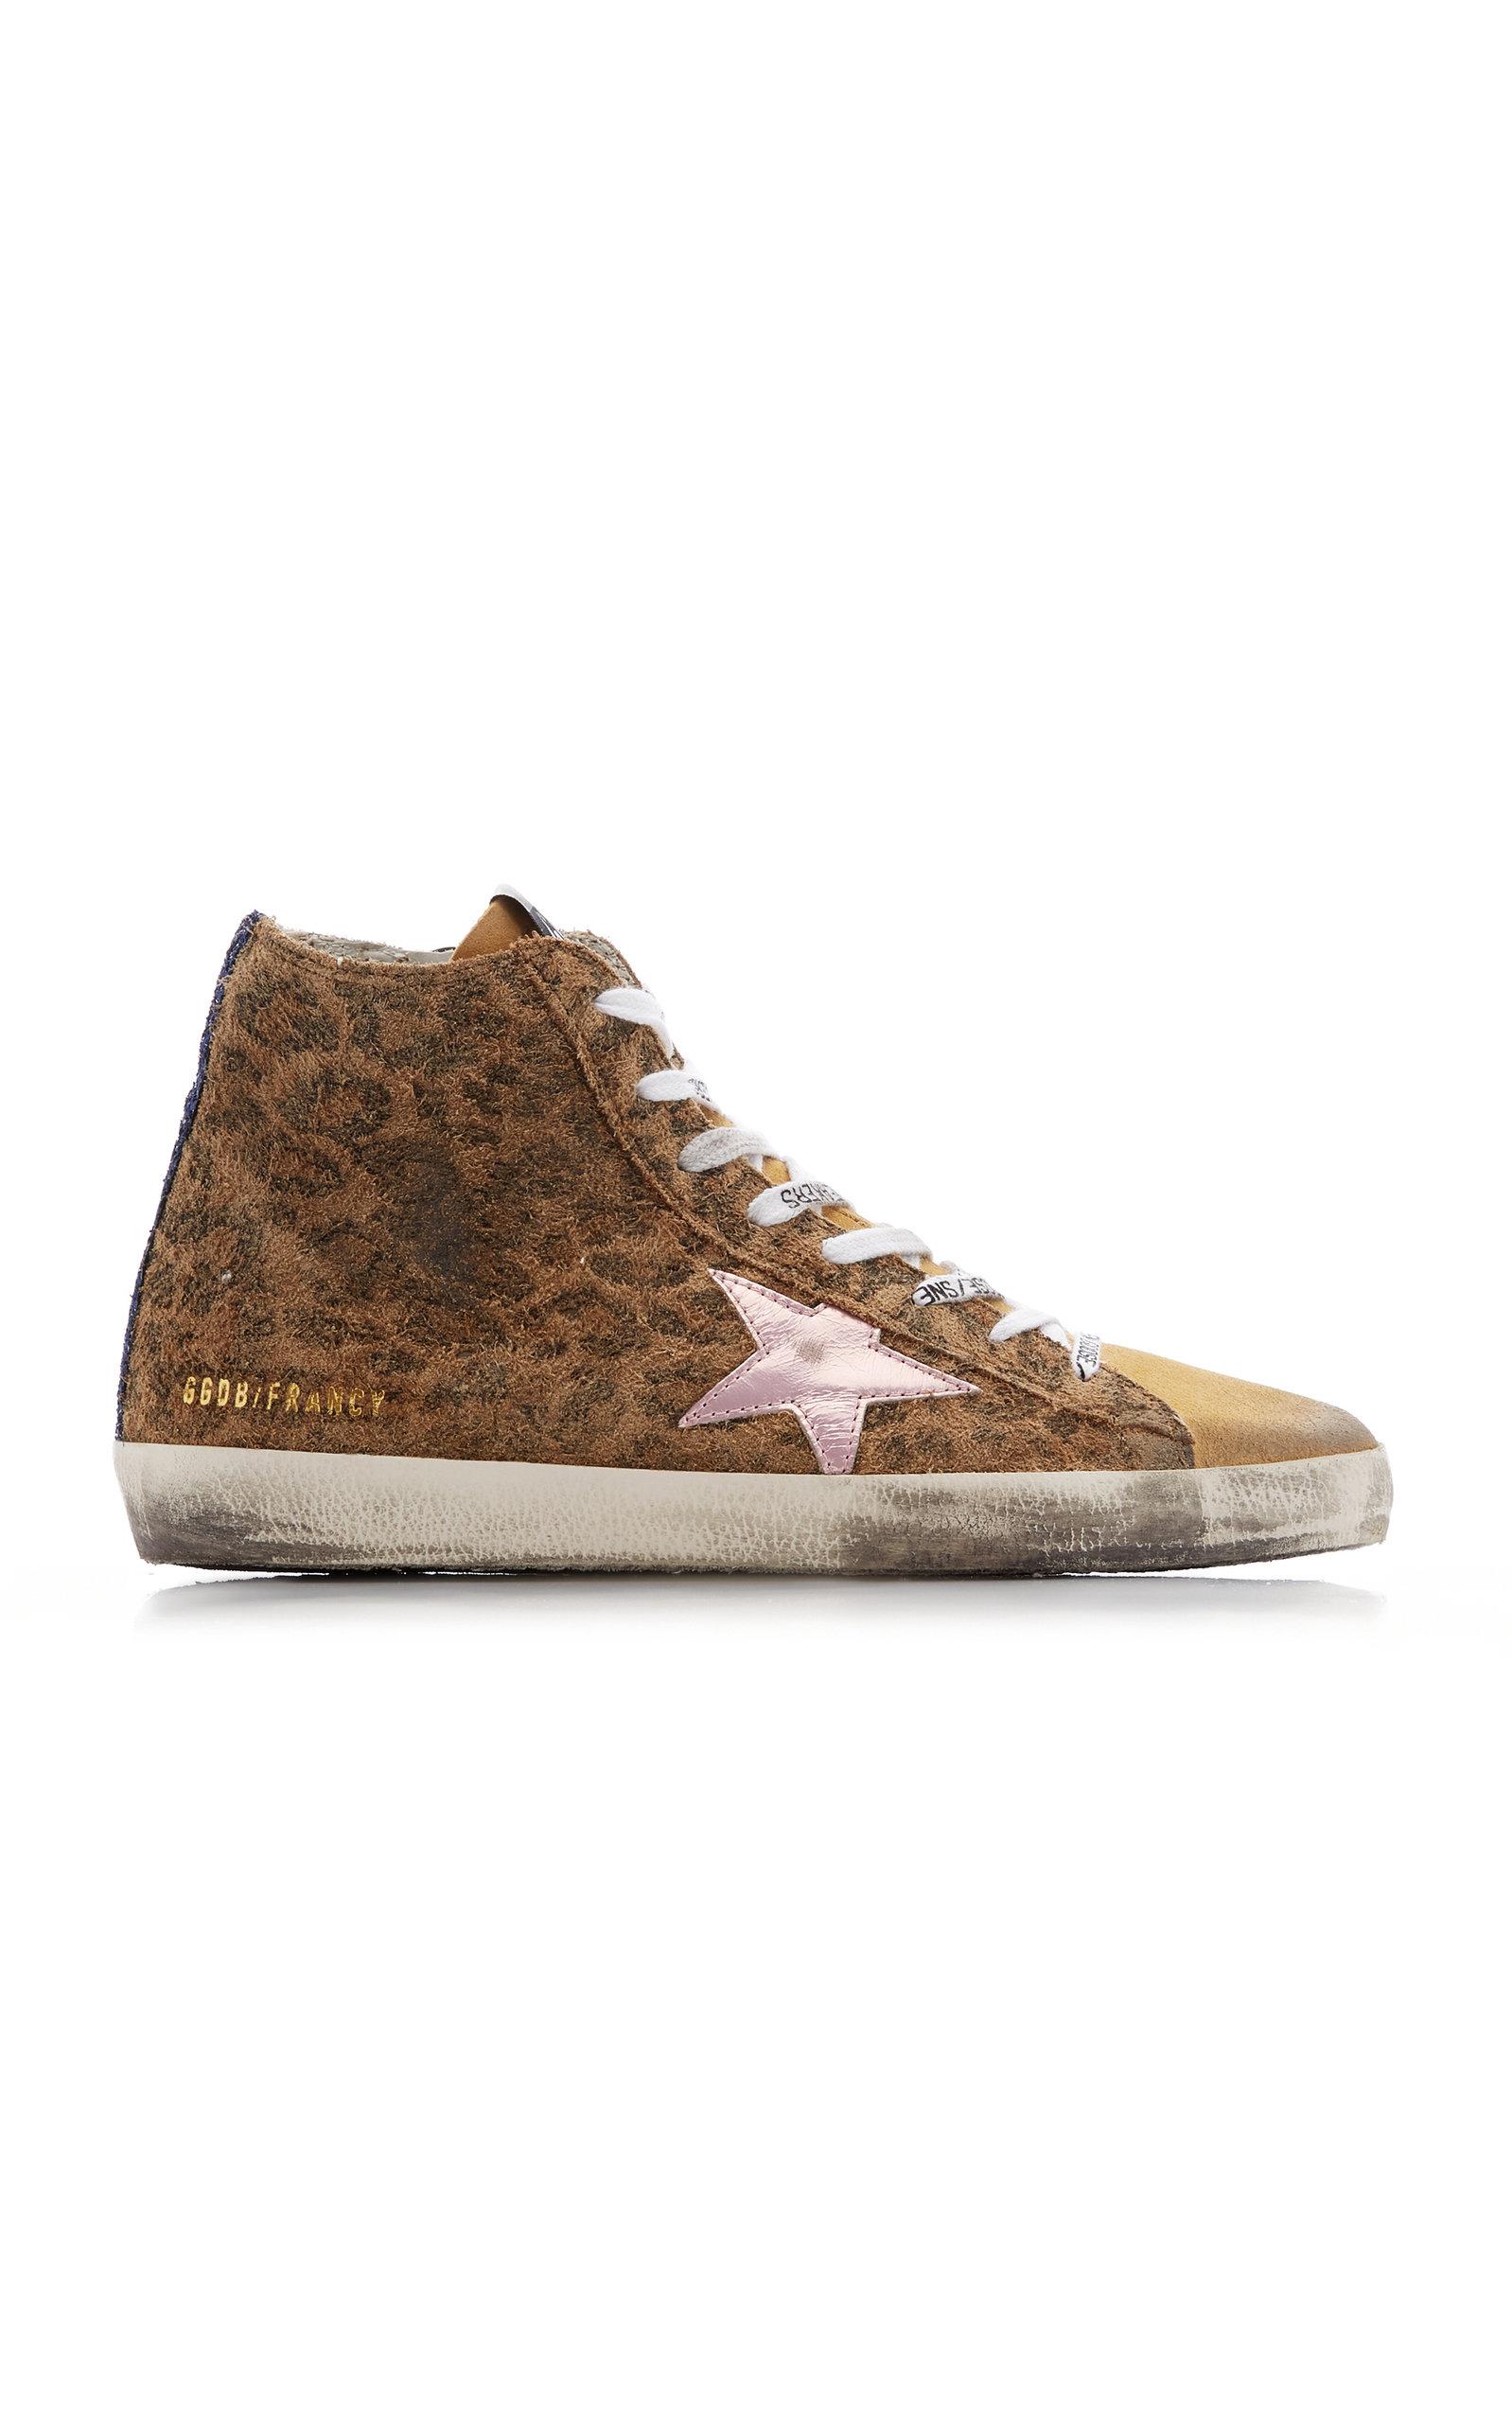 Golden Goose - Women's Francy Leopard-Print Suede Sneakers - Animal - Moda Operandi